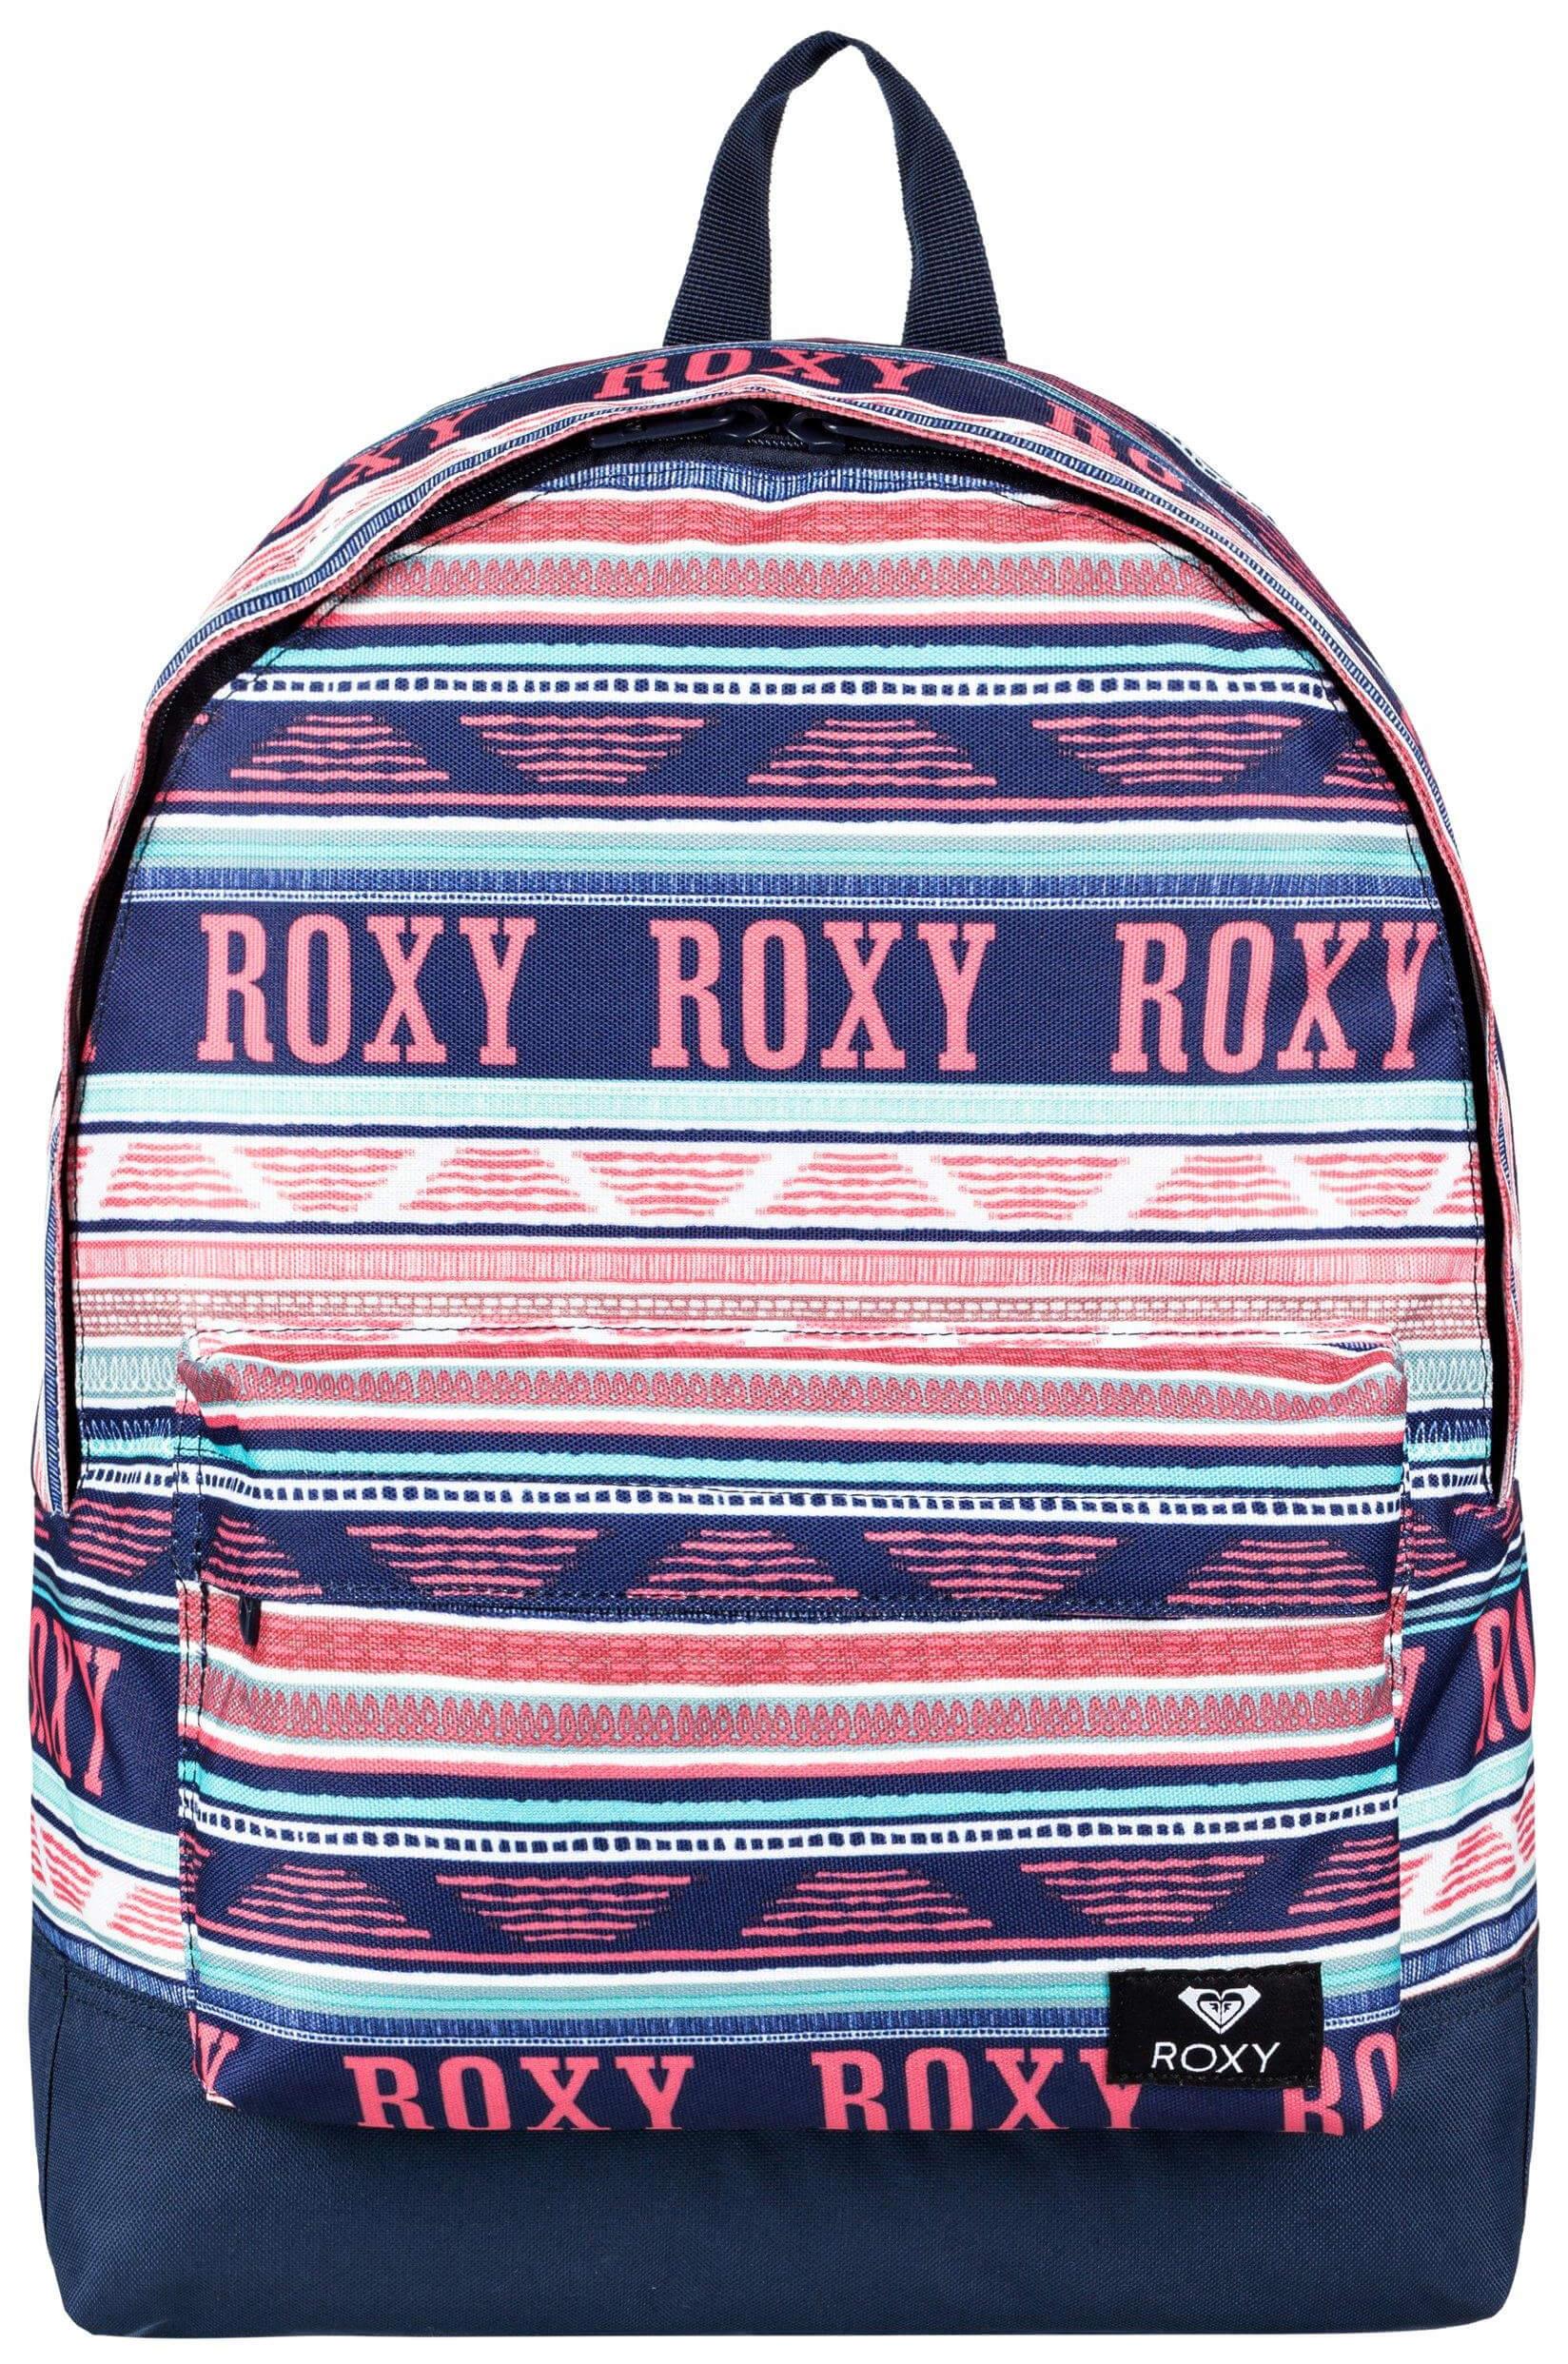 Roxy Batoh Sugar Baby Bright White Ax Boheme Border ERJBP03728-XWBG ... 6758fd5306